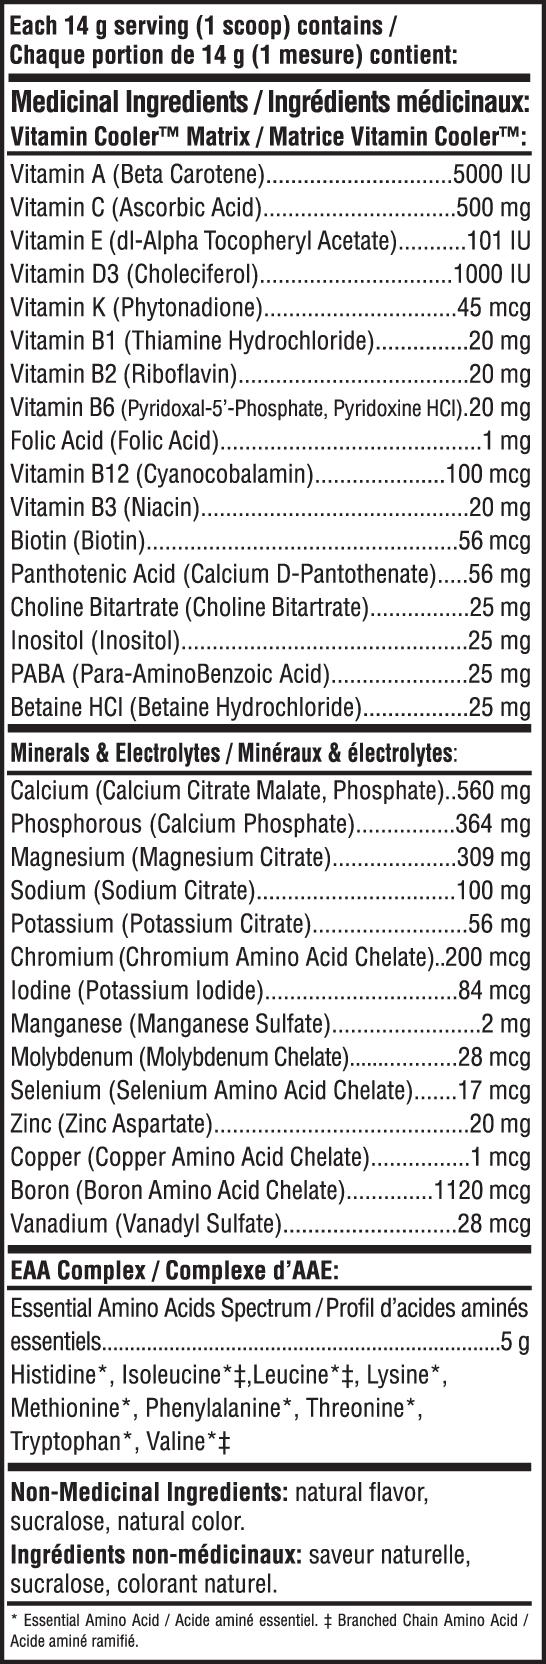 revolution_vitamin_cooler_info.jpg